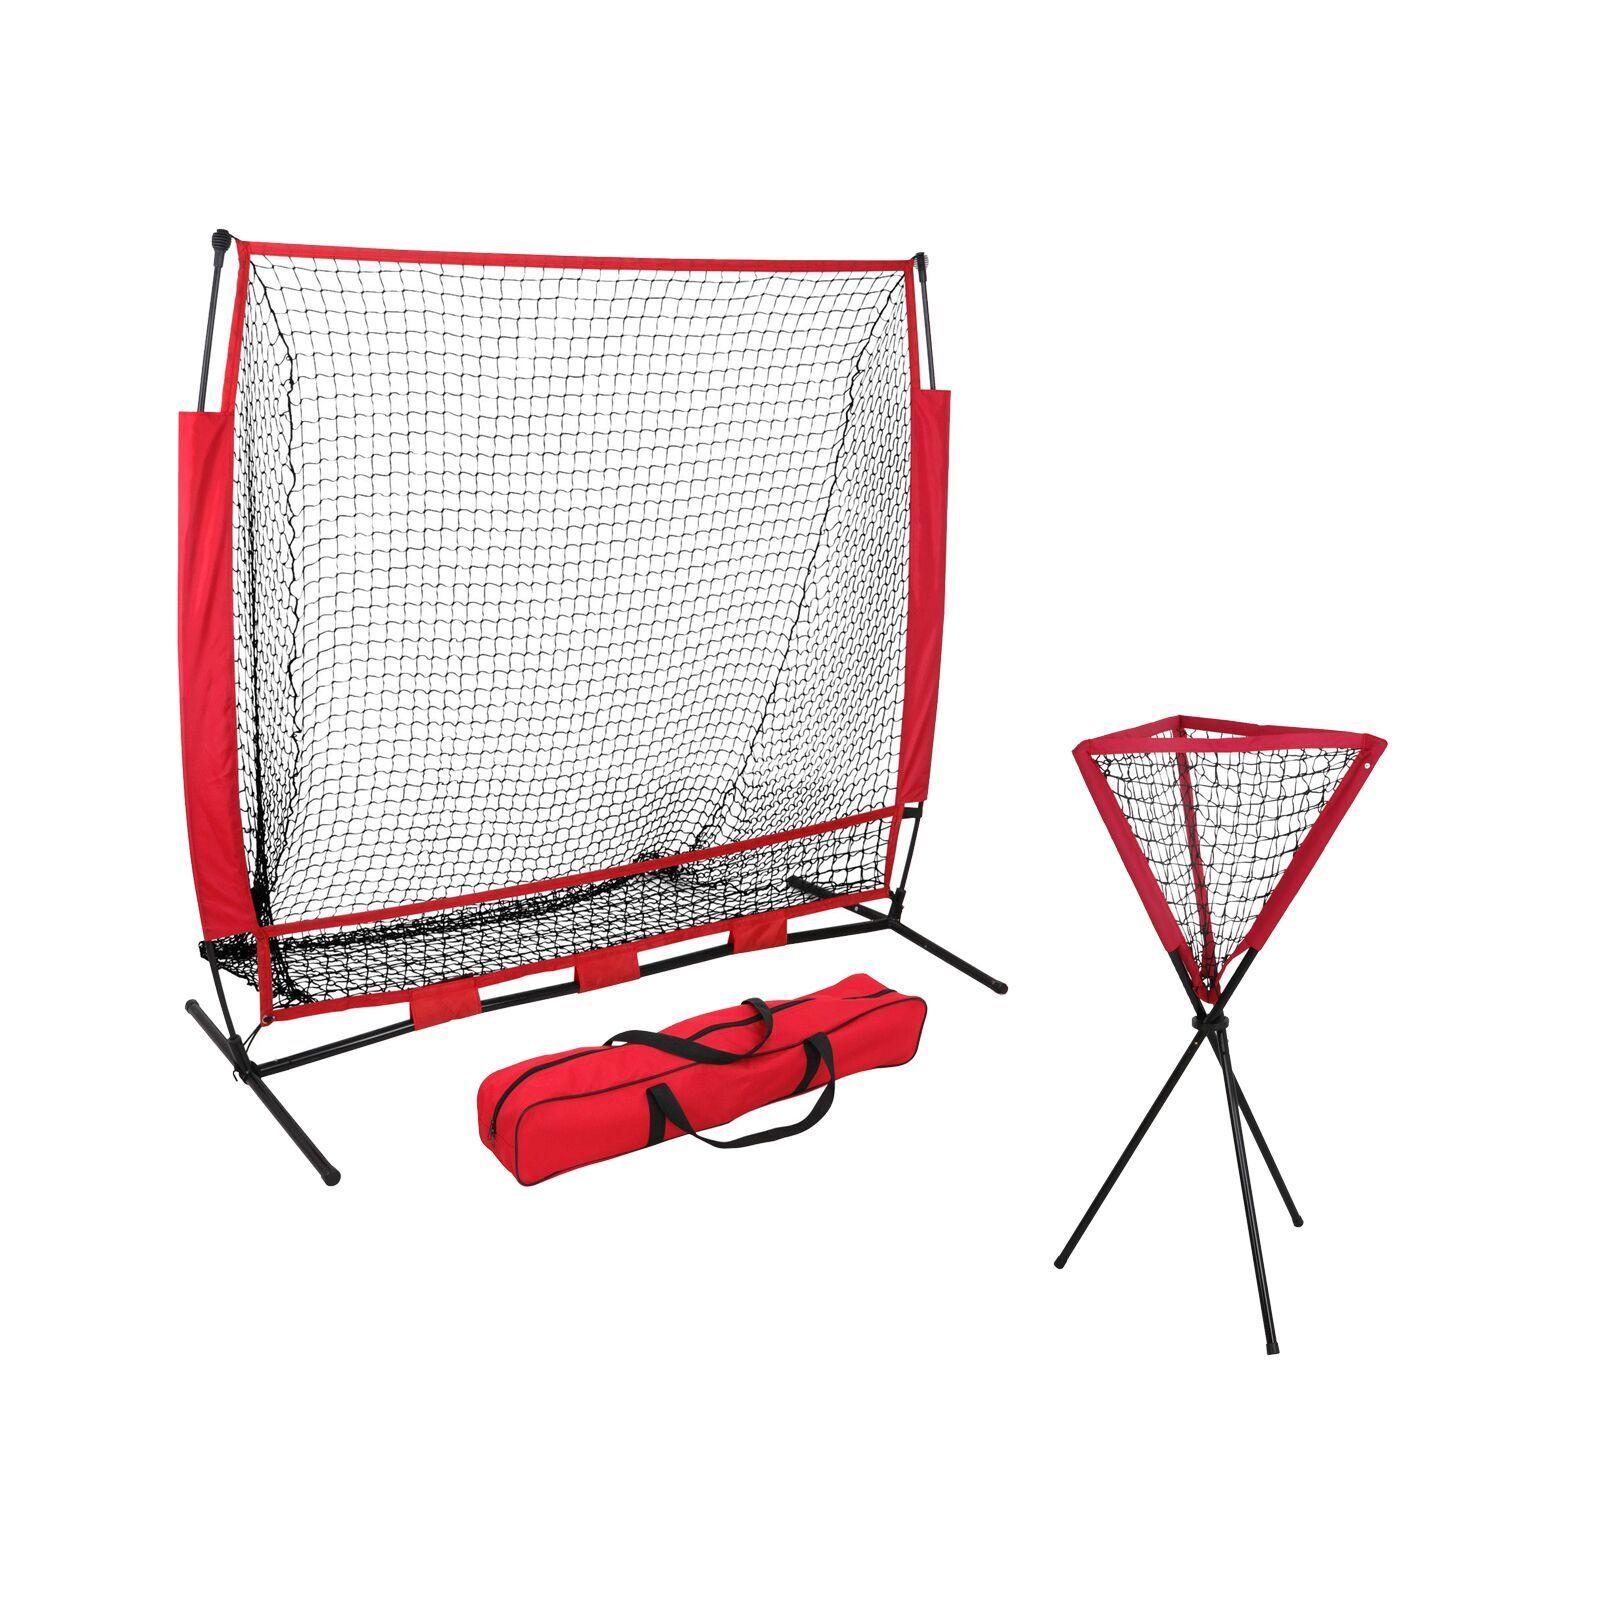 5 x 5′ Commercial Grade Portable Baseball Practice Net + Tripod Stand Ball Caddy Baseball & Softball